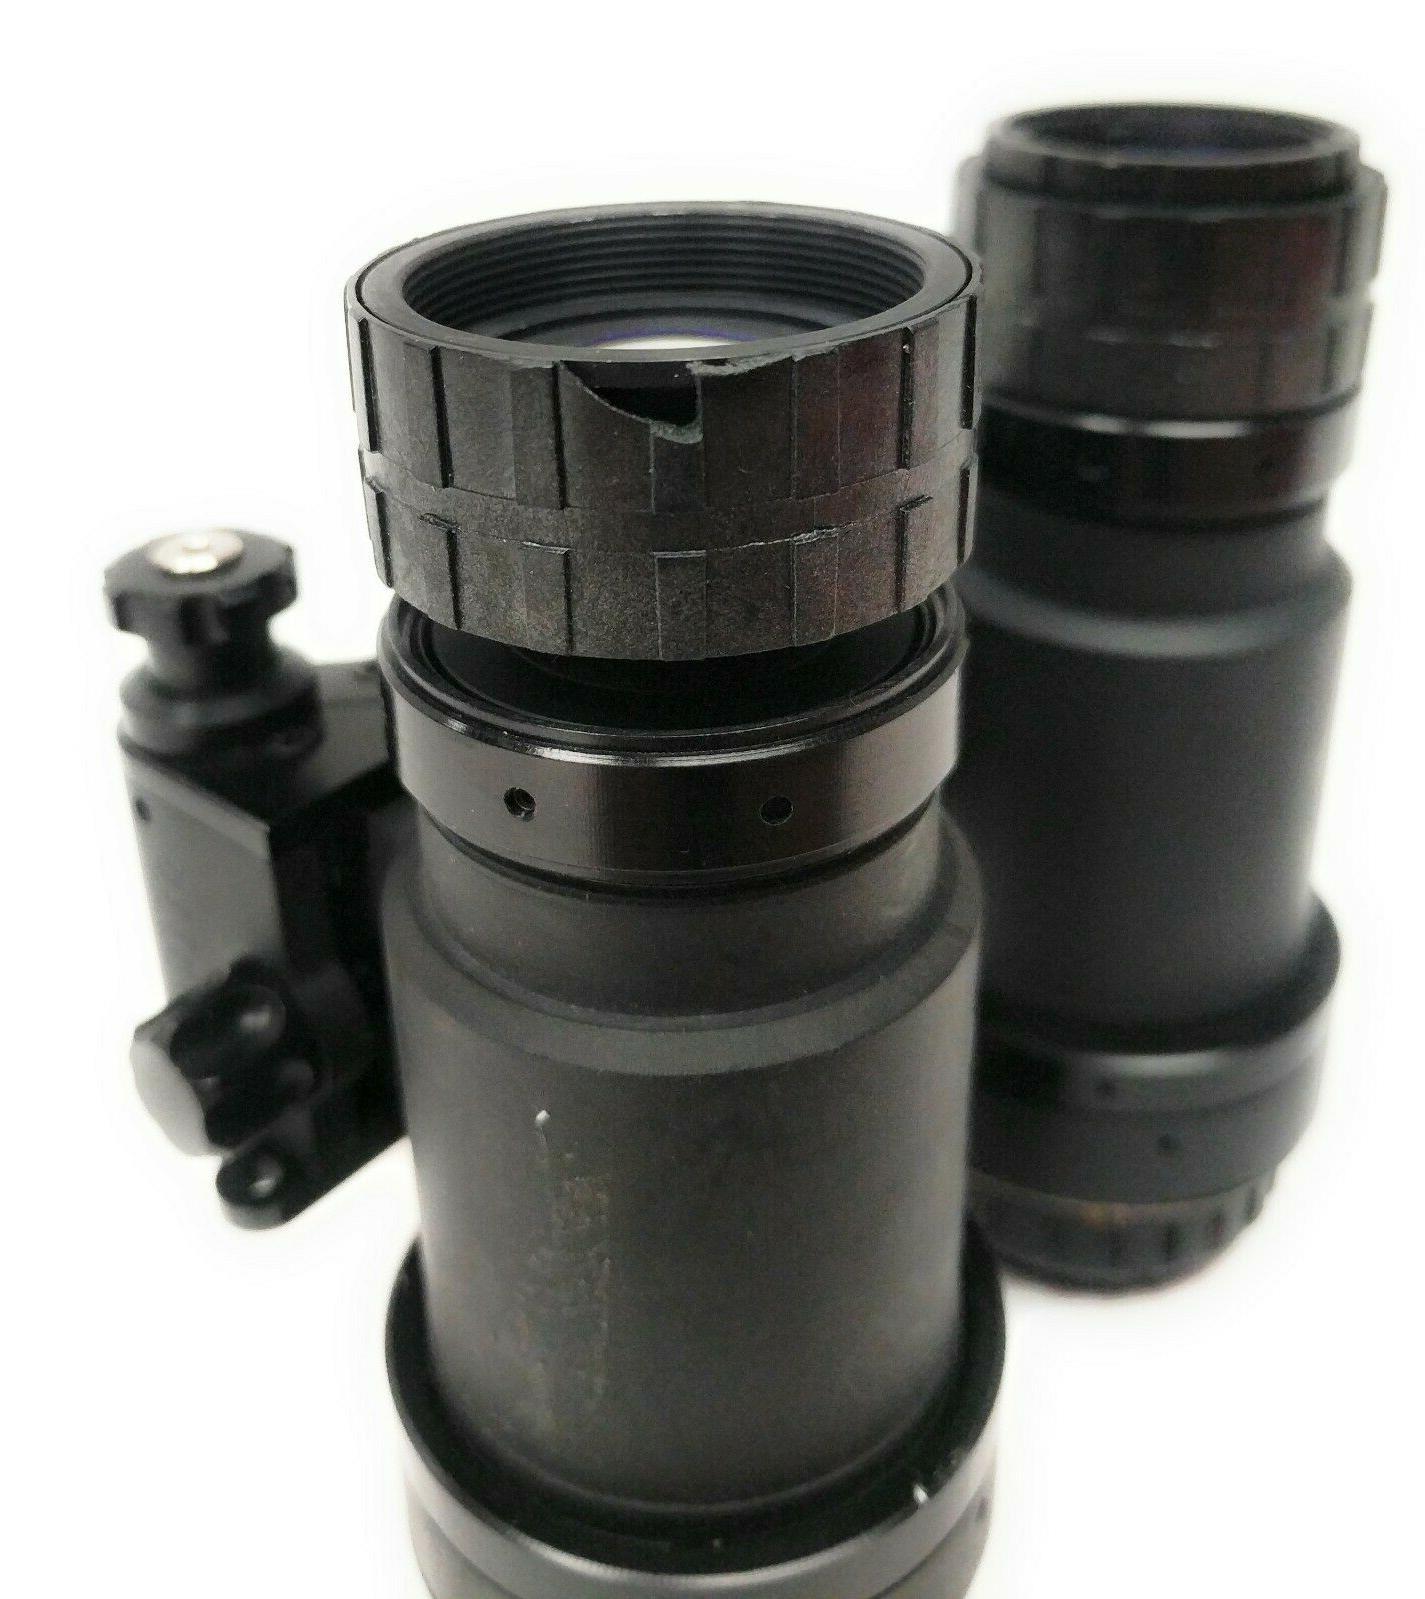 Carson Industries 1XEP3 Night Vision Binoculars w/ F9800H